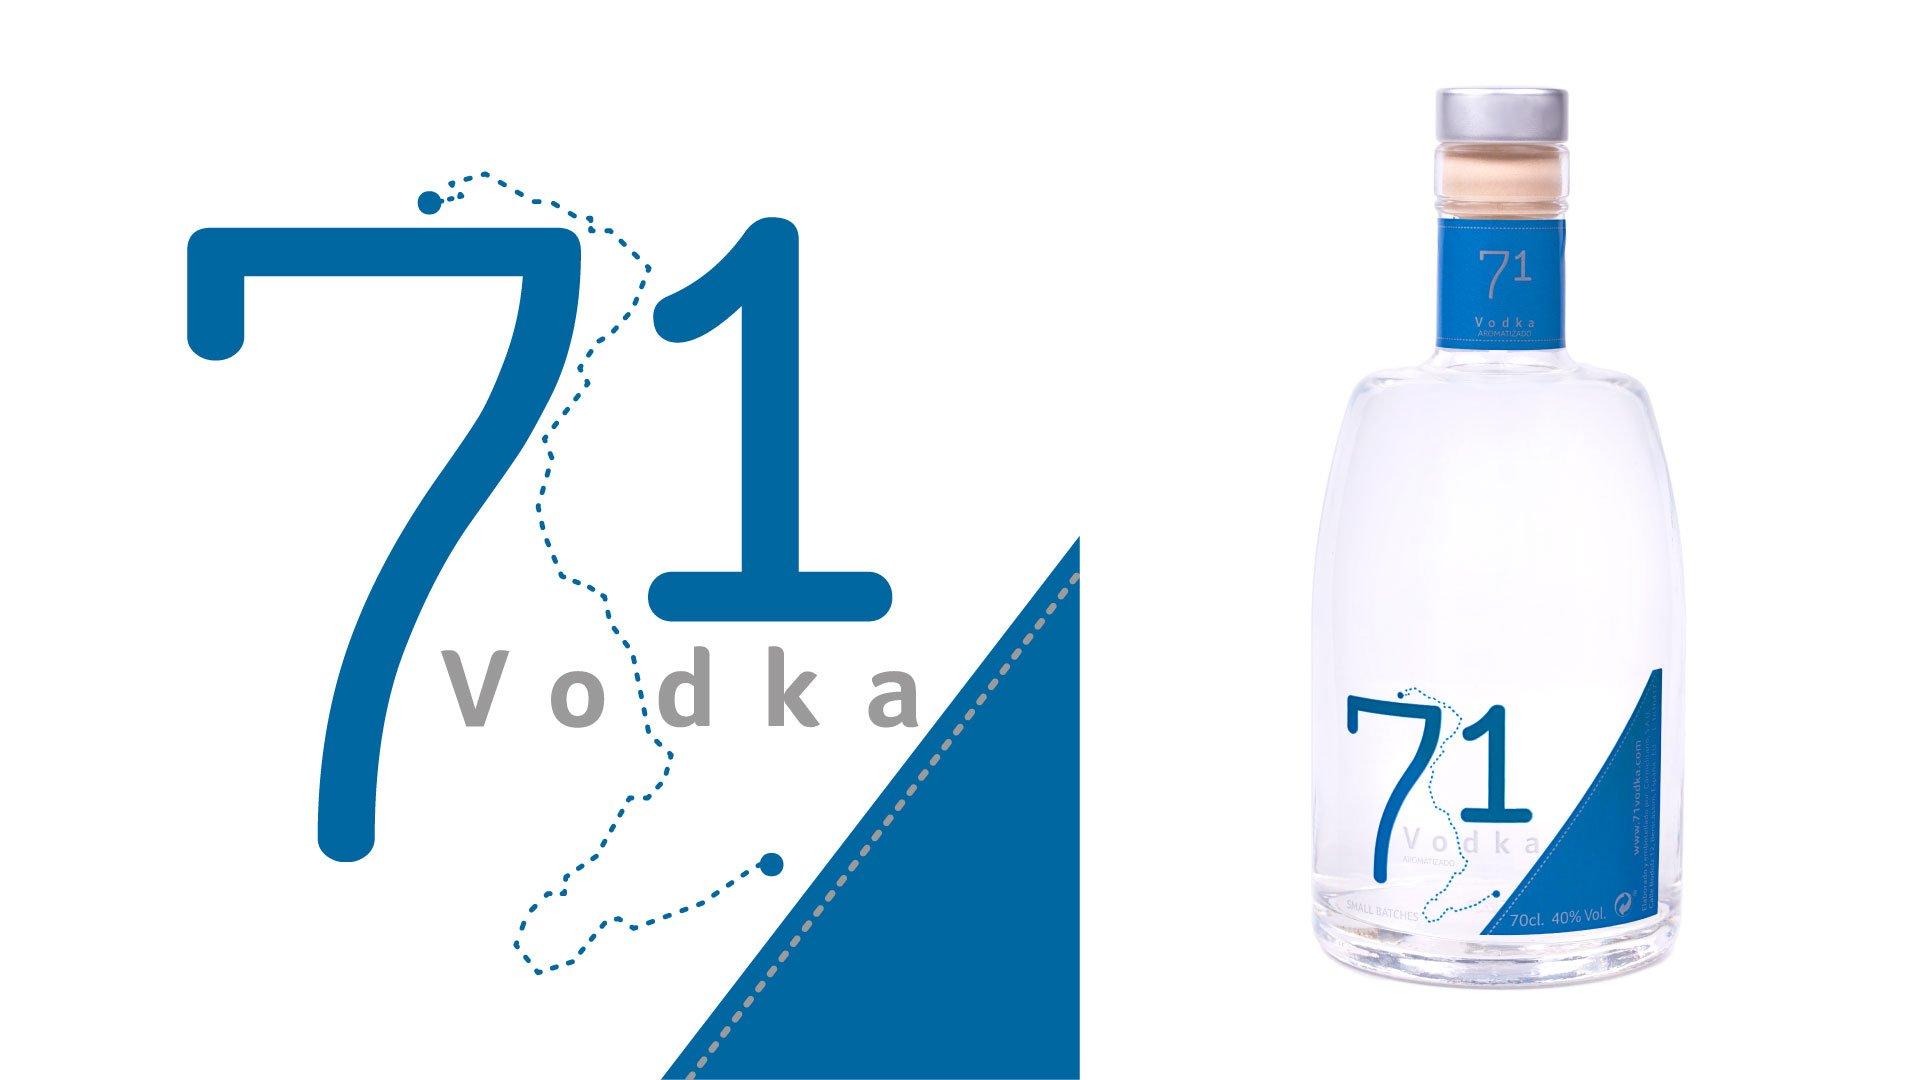 Digitus-Carmelitano-71vodka-branding-02